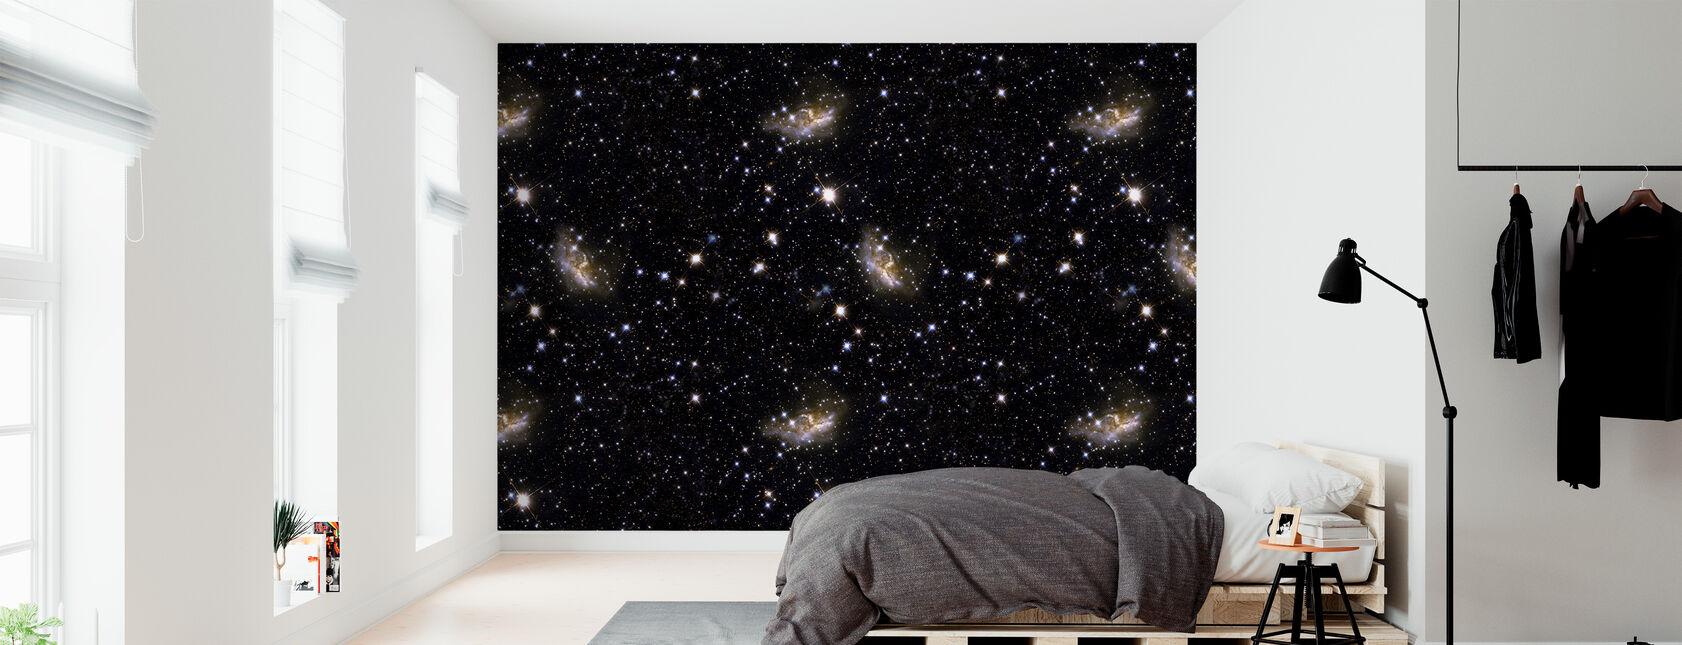 Galaxy Storm - Wallpaper - Bedroom